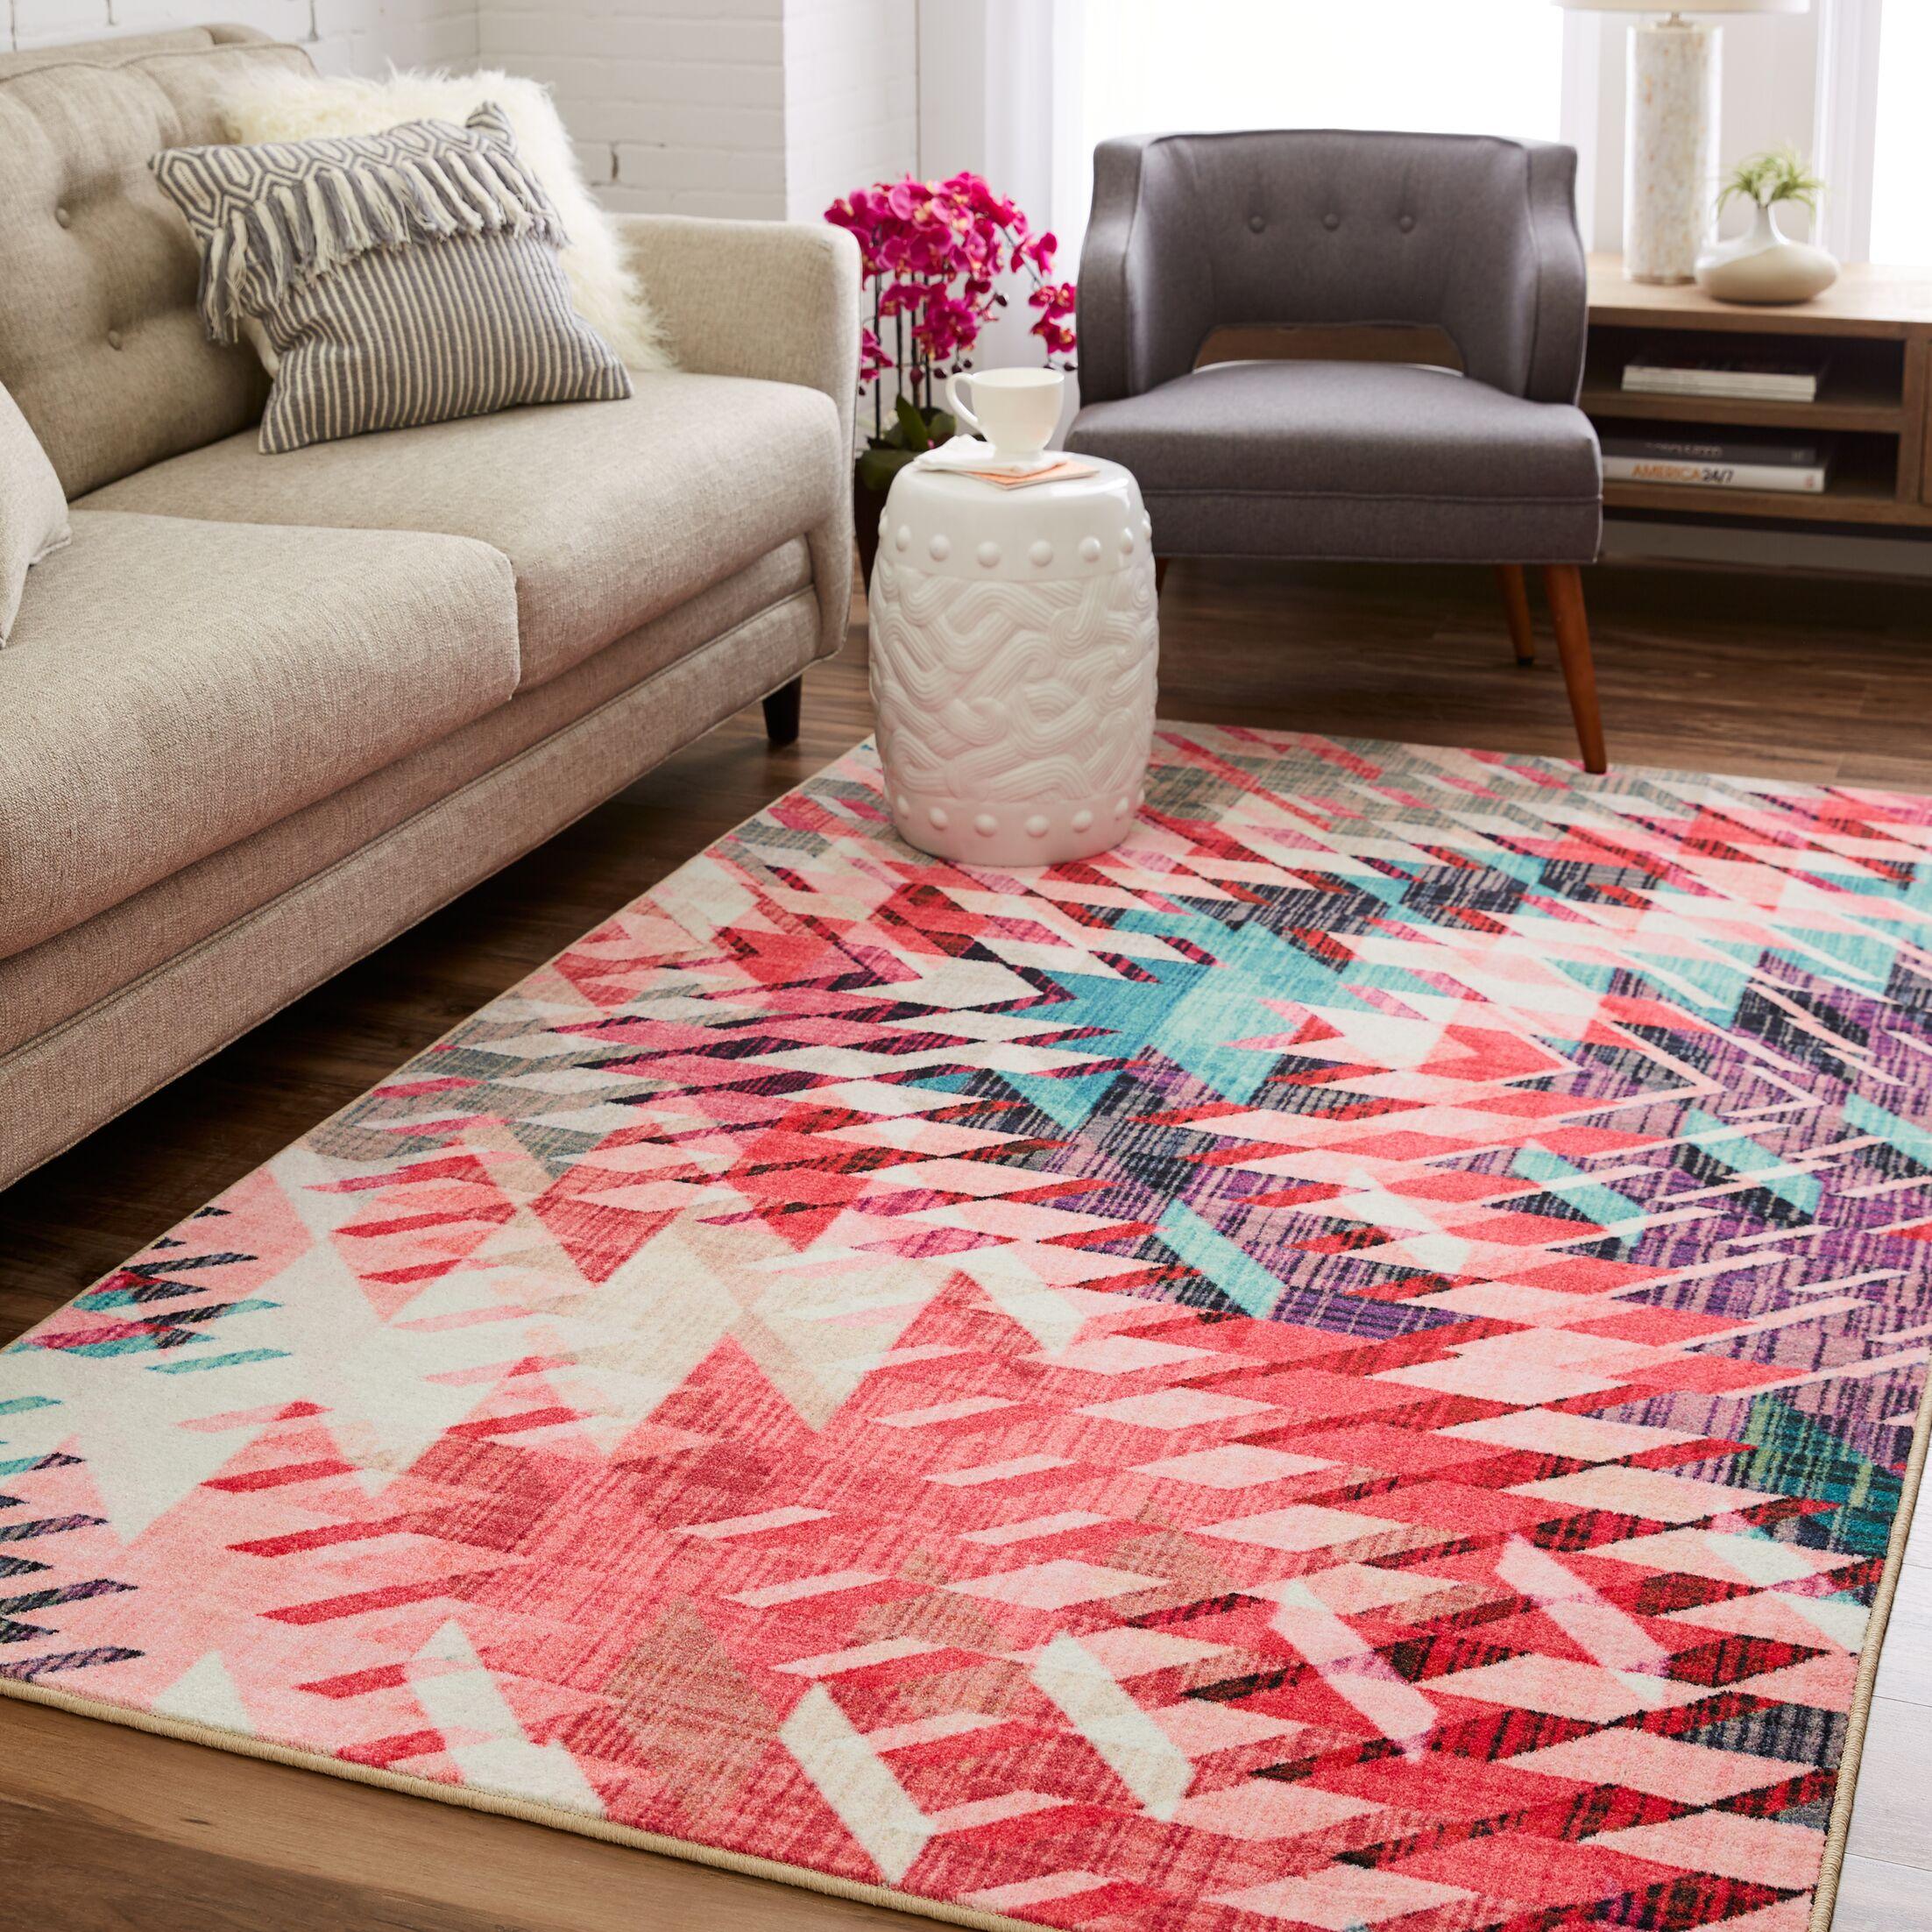 Mccready Pink/Teal Area Rug Rug Size: Rectangle 5' x 8'